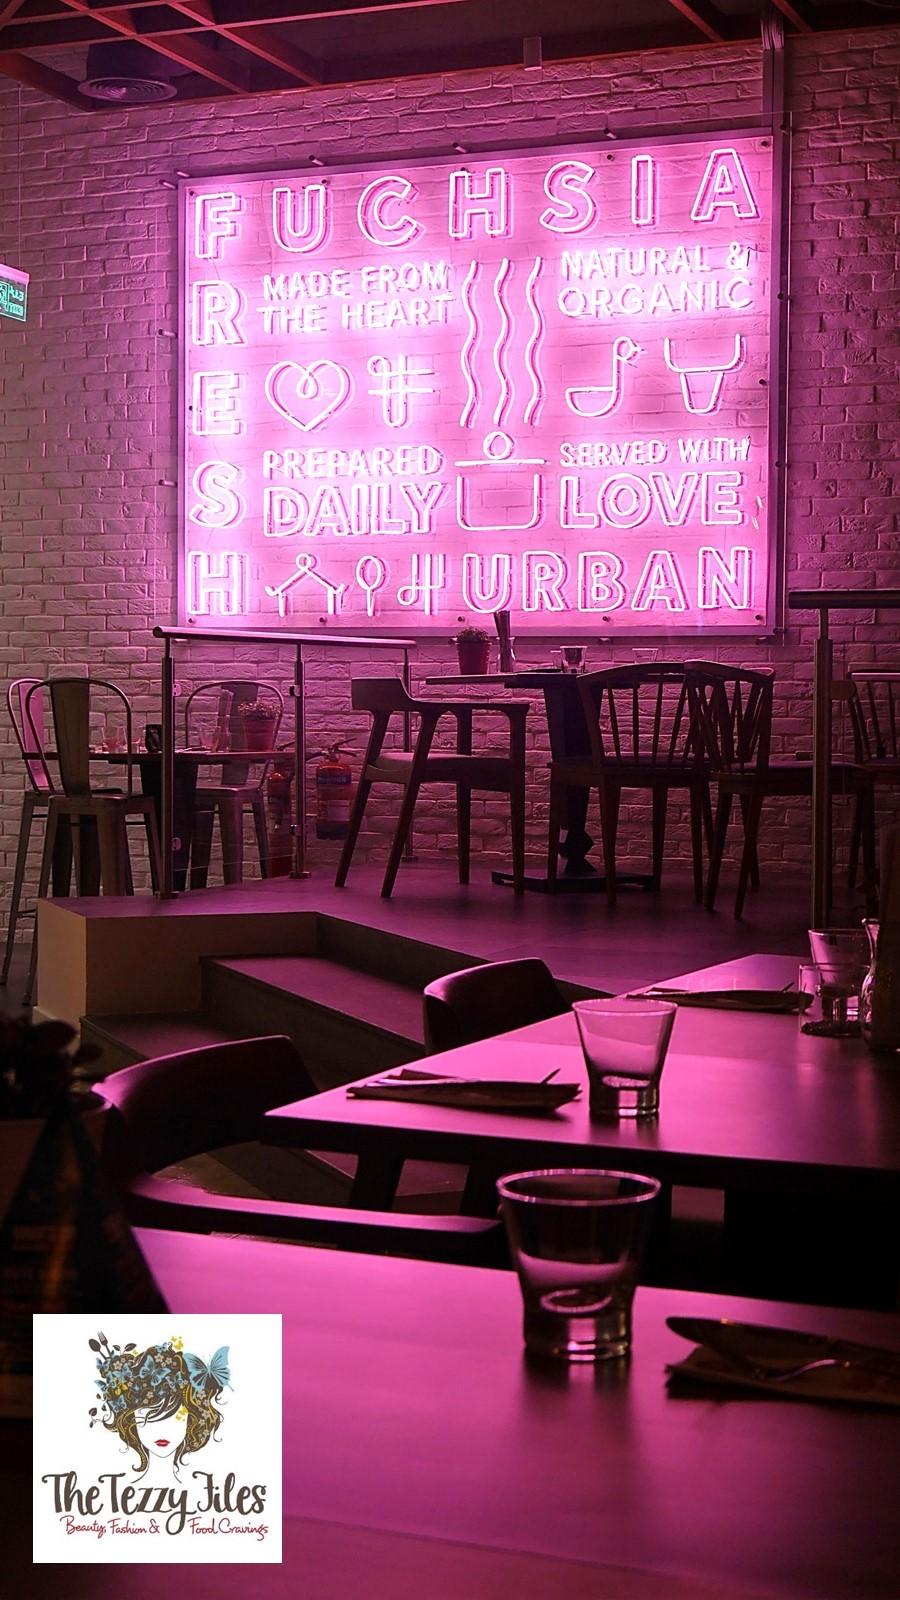 Fuchsia Dubai Thai Restaurant Business Bay Barsha Review by The Tezzy Files Dubai Food Blog Blogger Zomato (15)